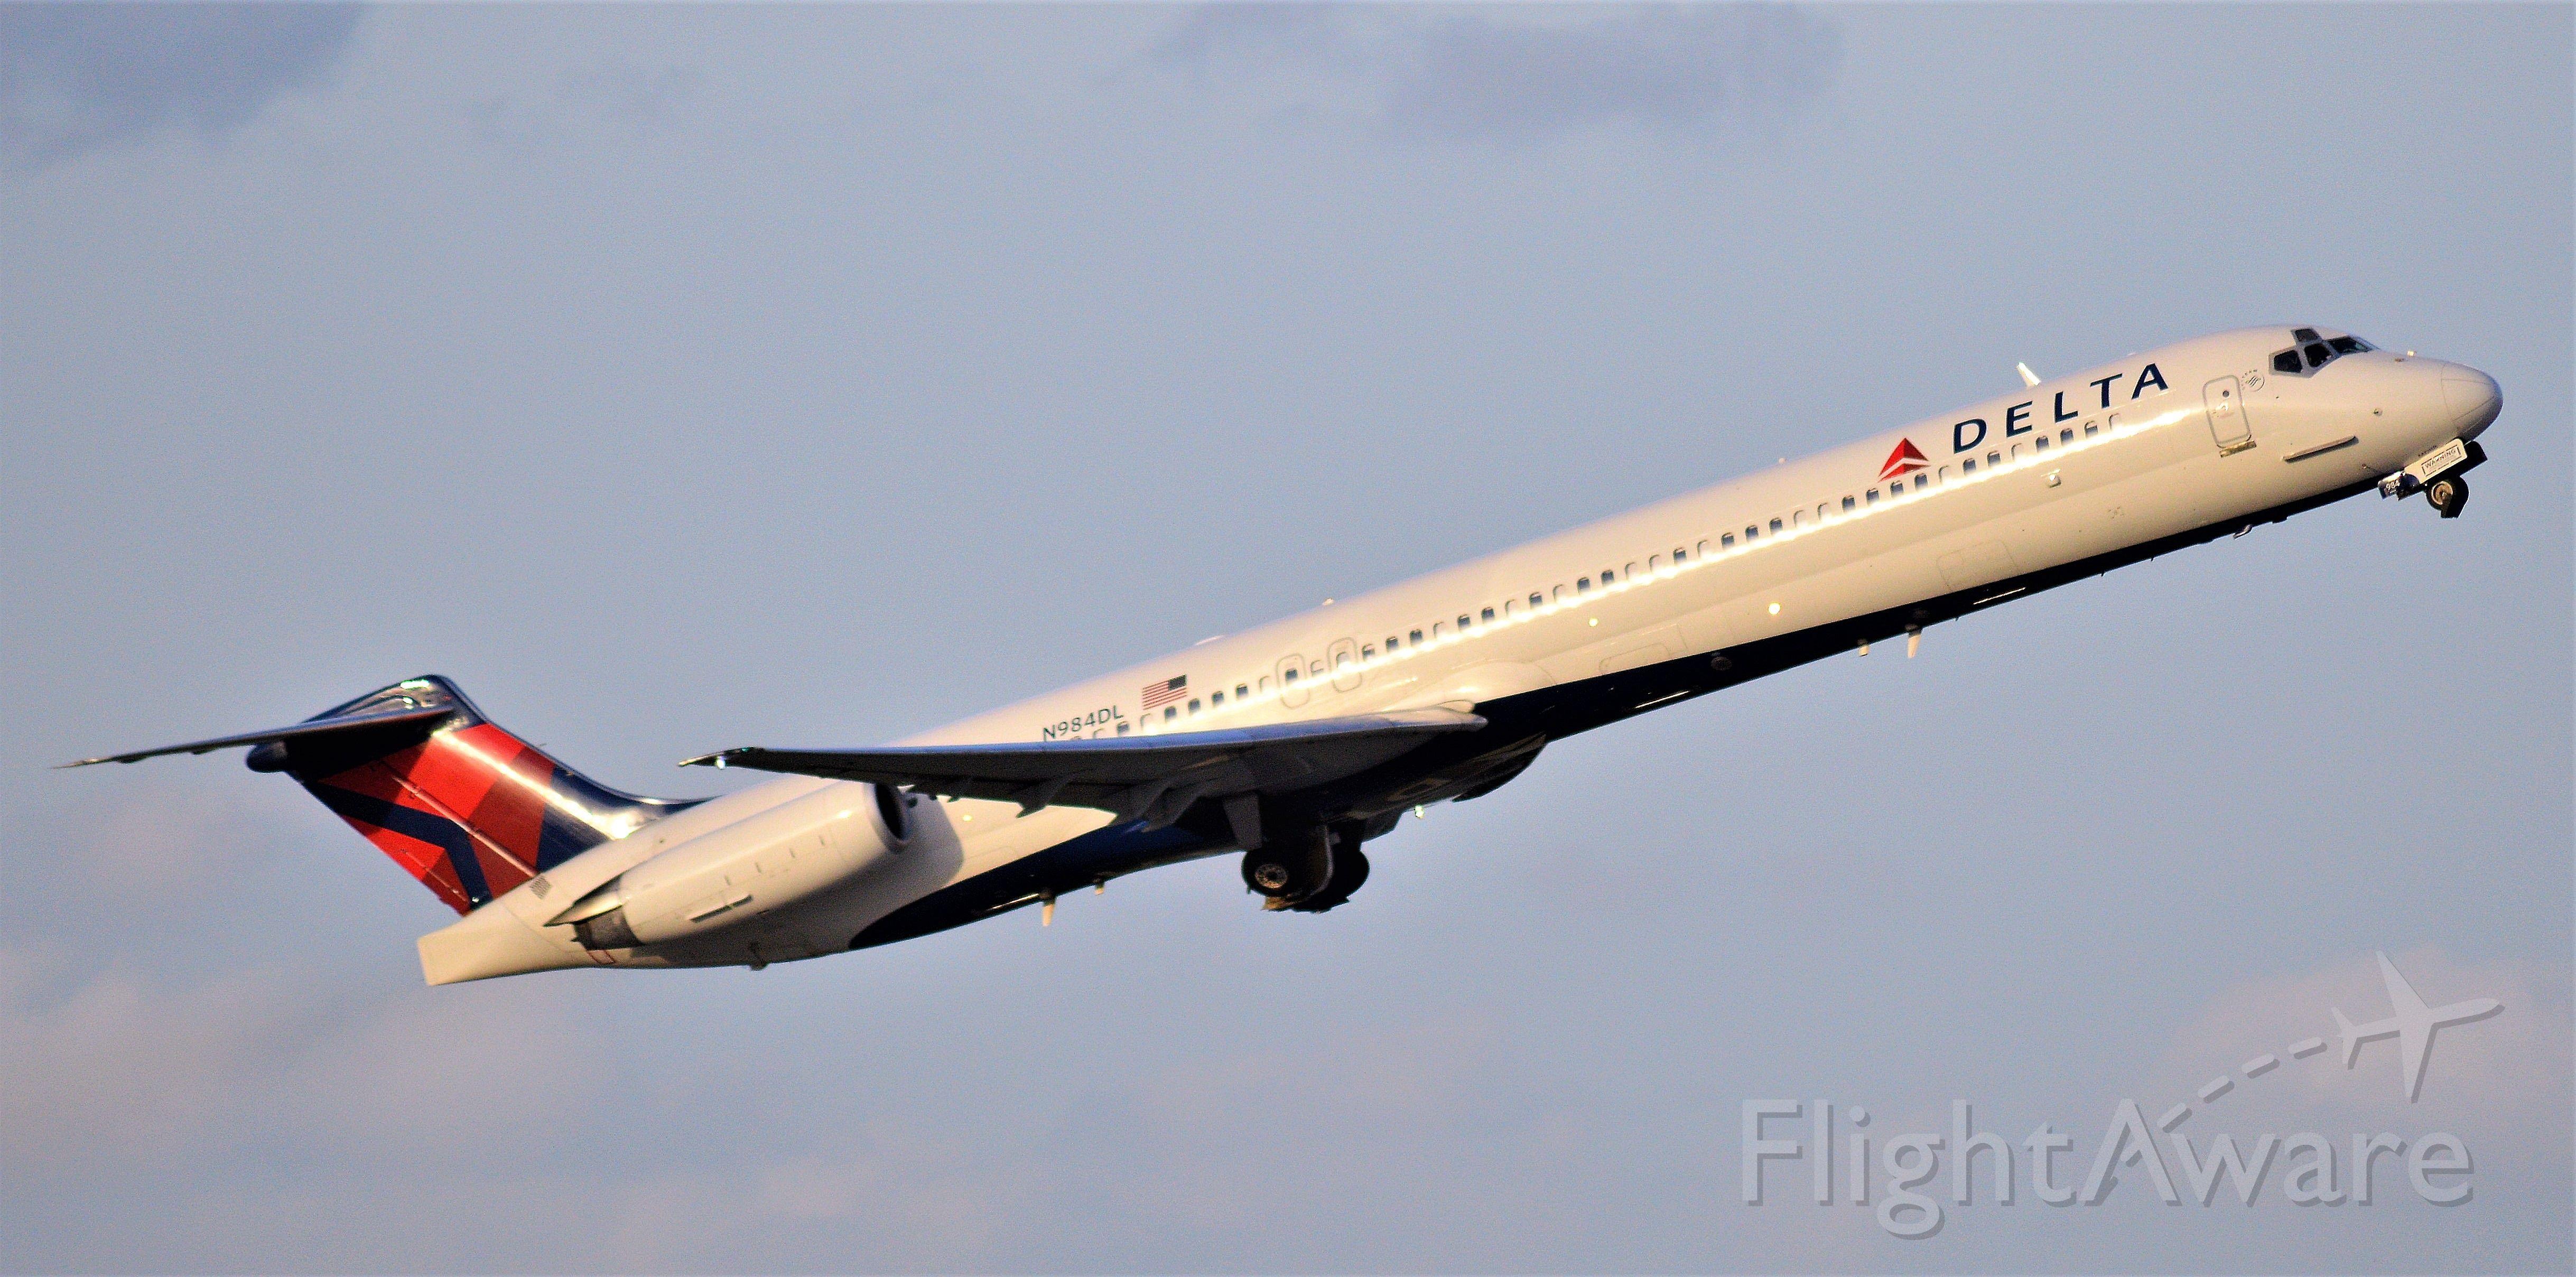 McDonnell Douglas MD-88 (N984DL)